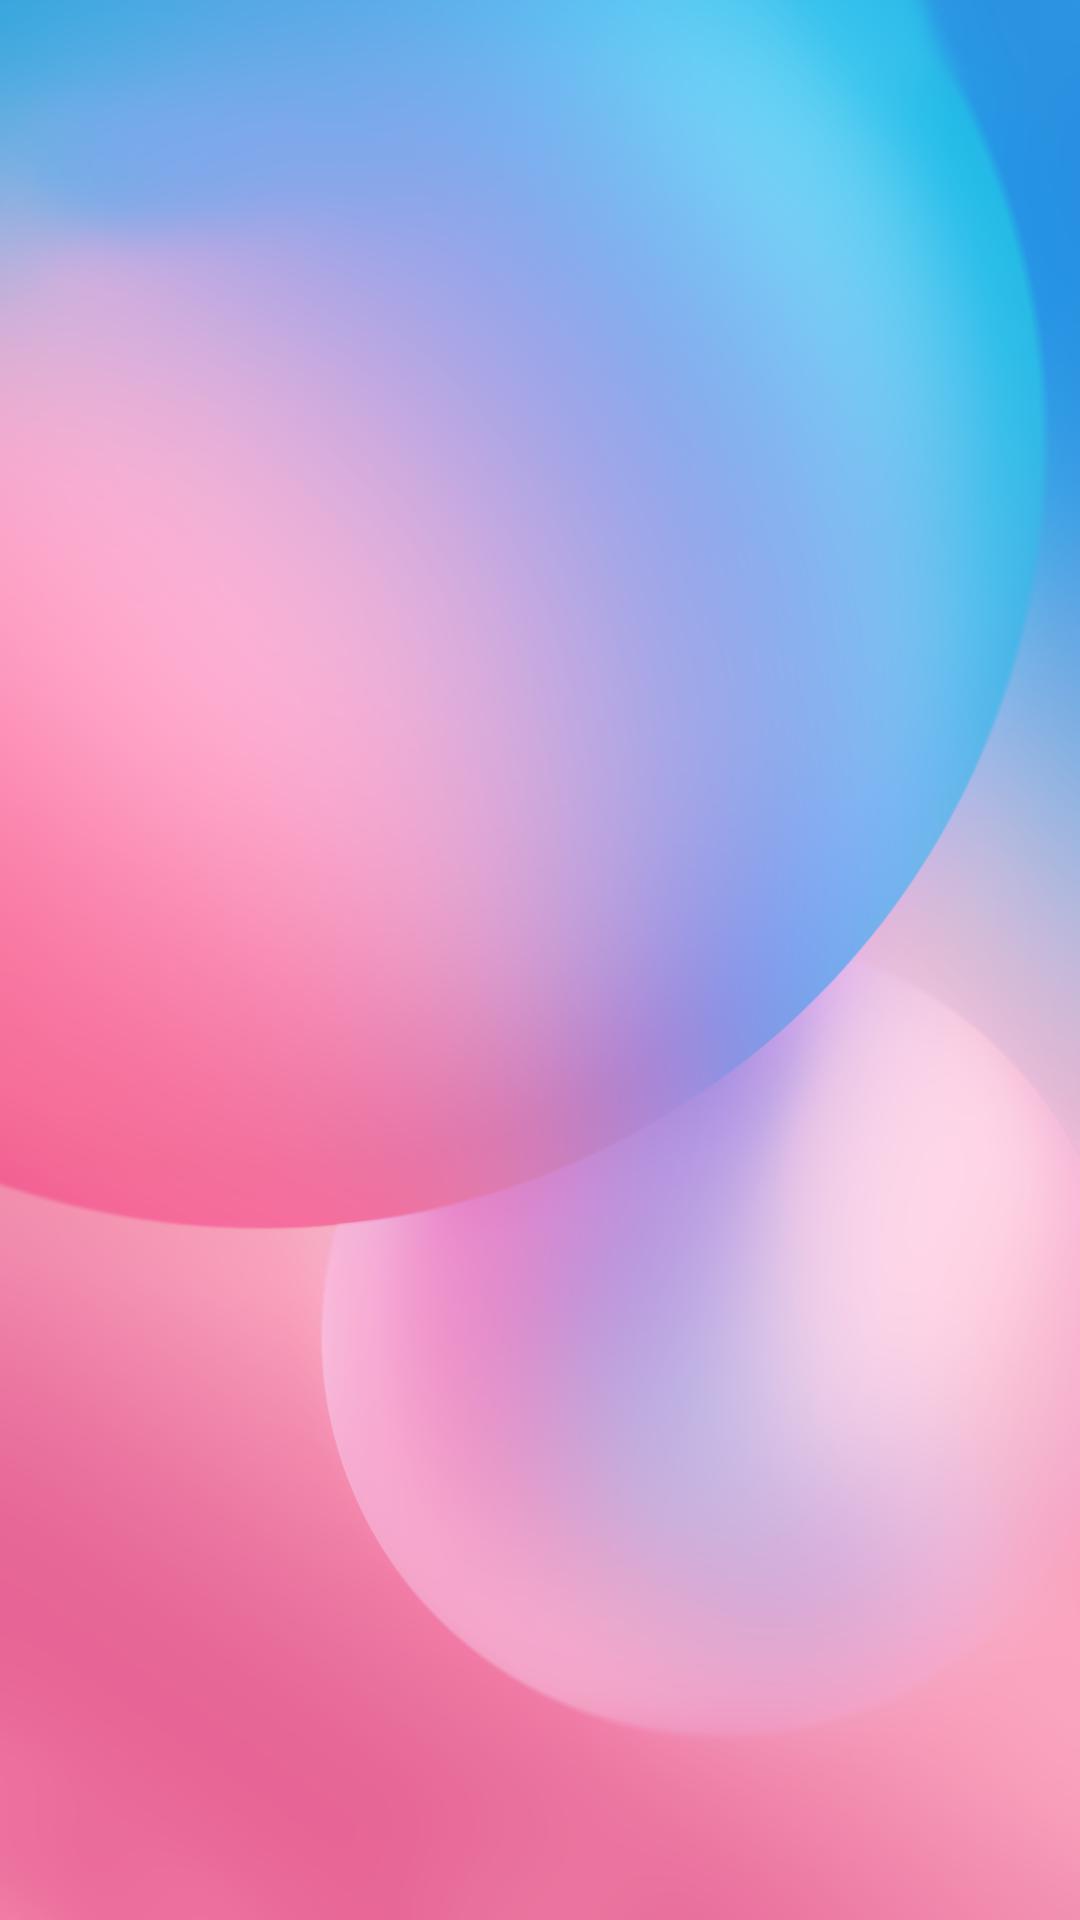 miui_9_wall_techfoogle_05